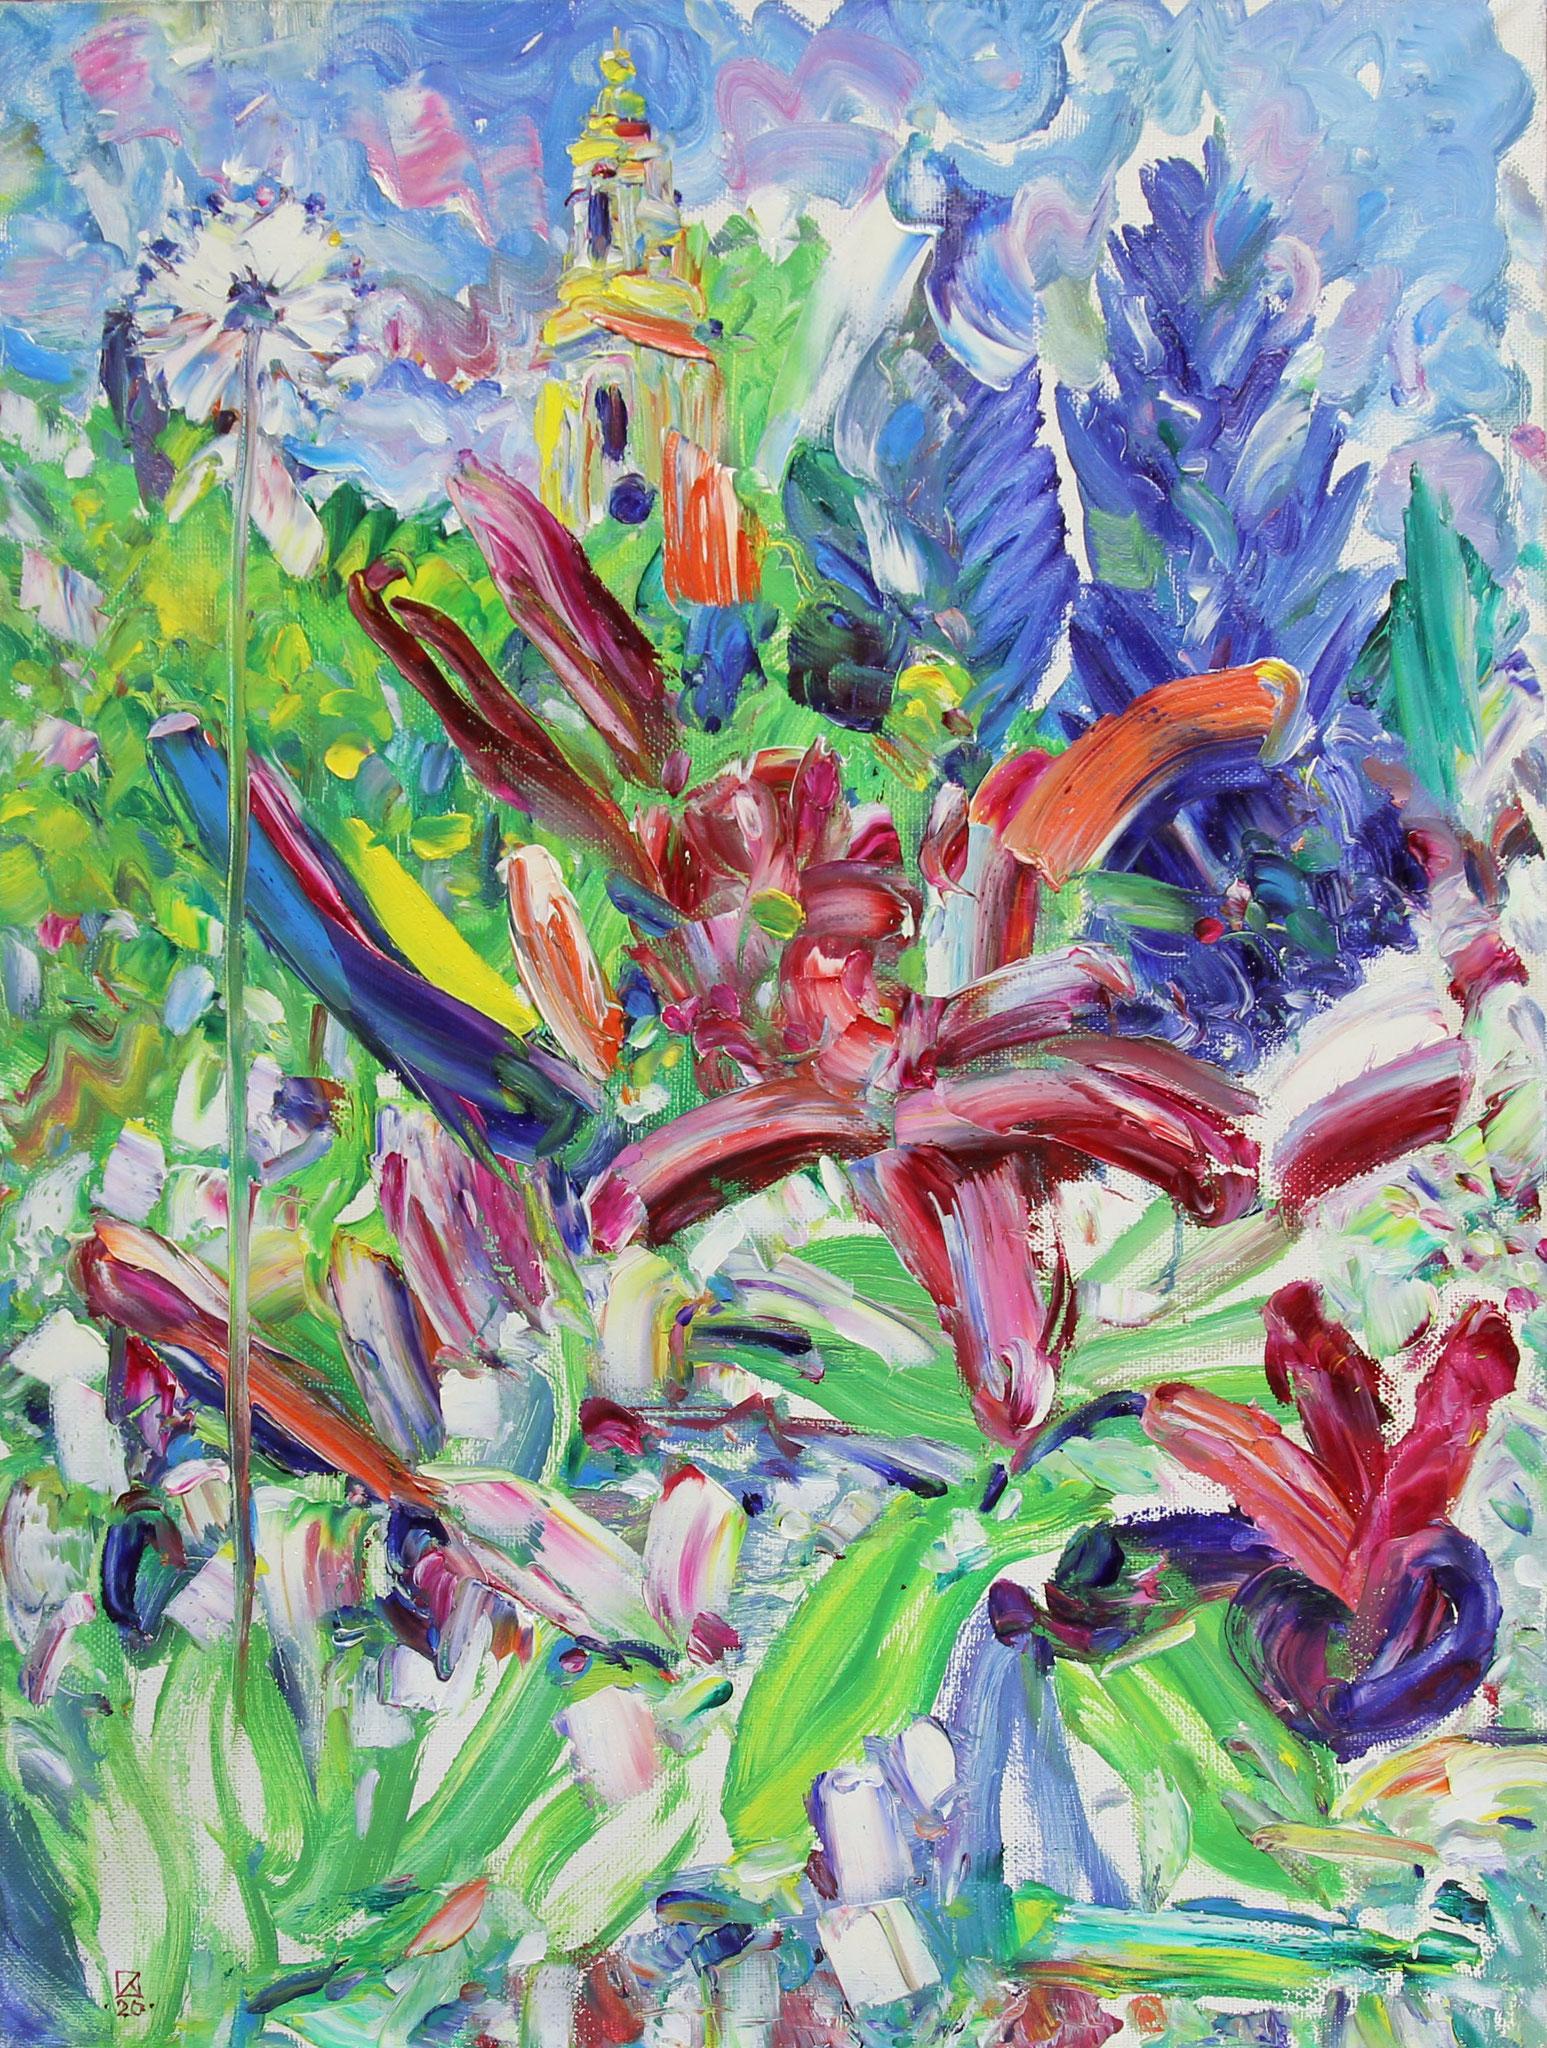 Novospassky Garden. 2020. Oil on canvas. 80 x 60